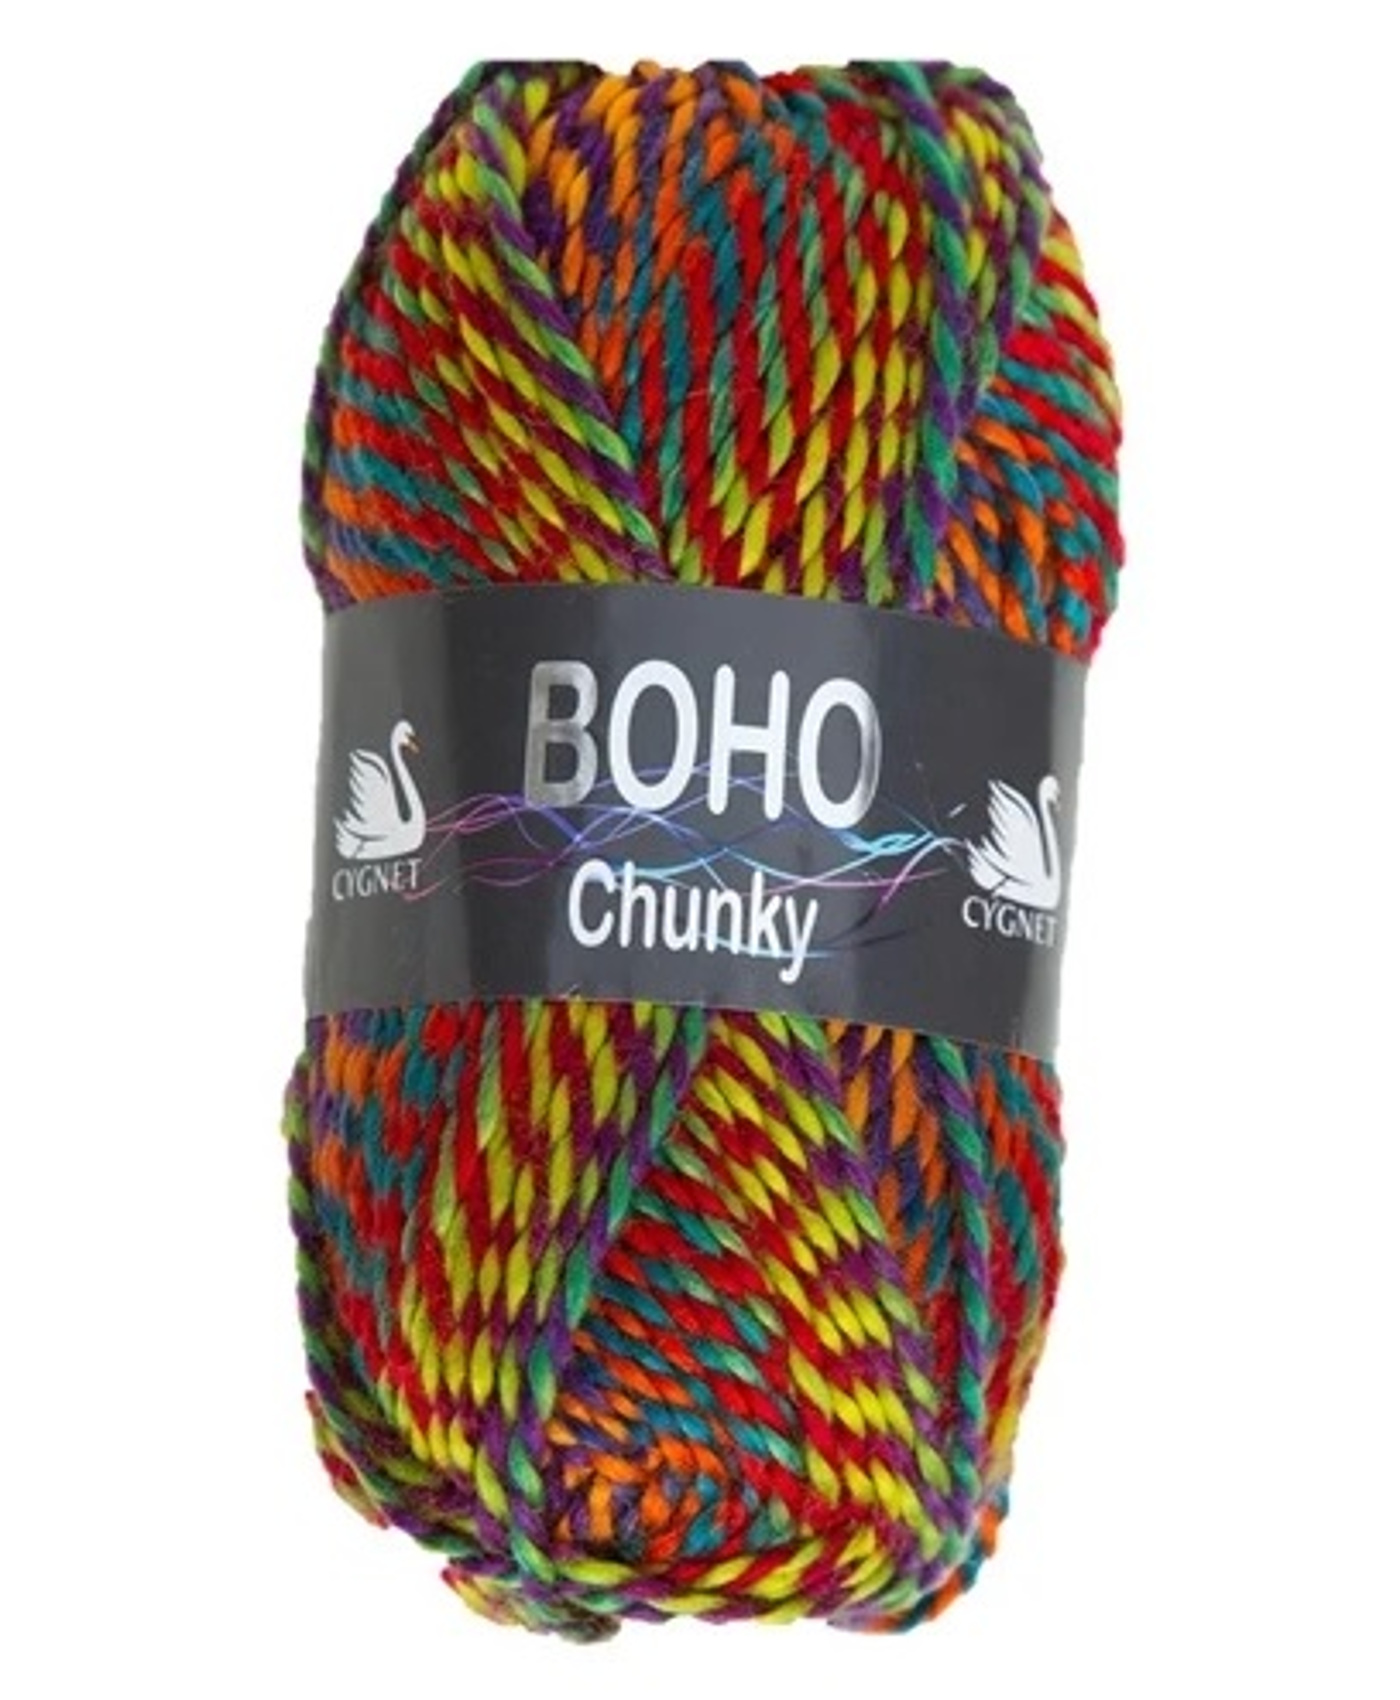 Boho Chunky 100g Ball Yarn & Free Knitting Pattern Cygnet ...